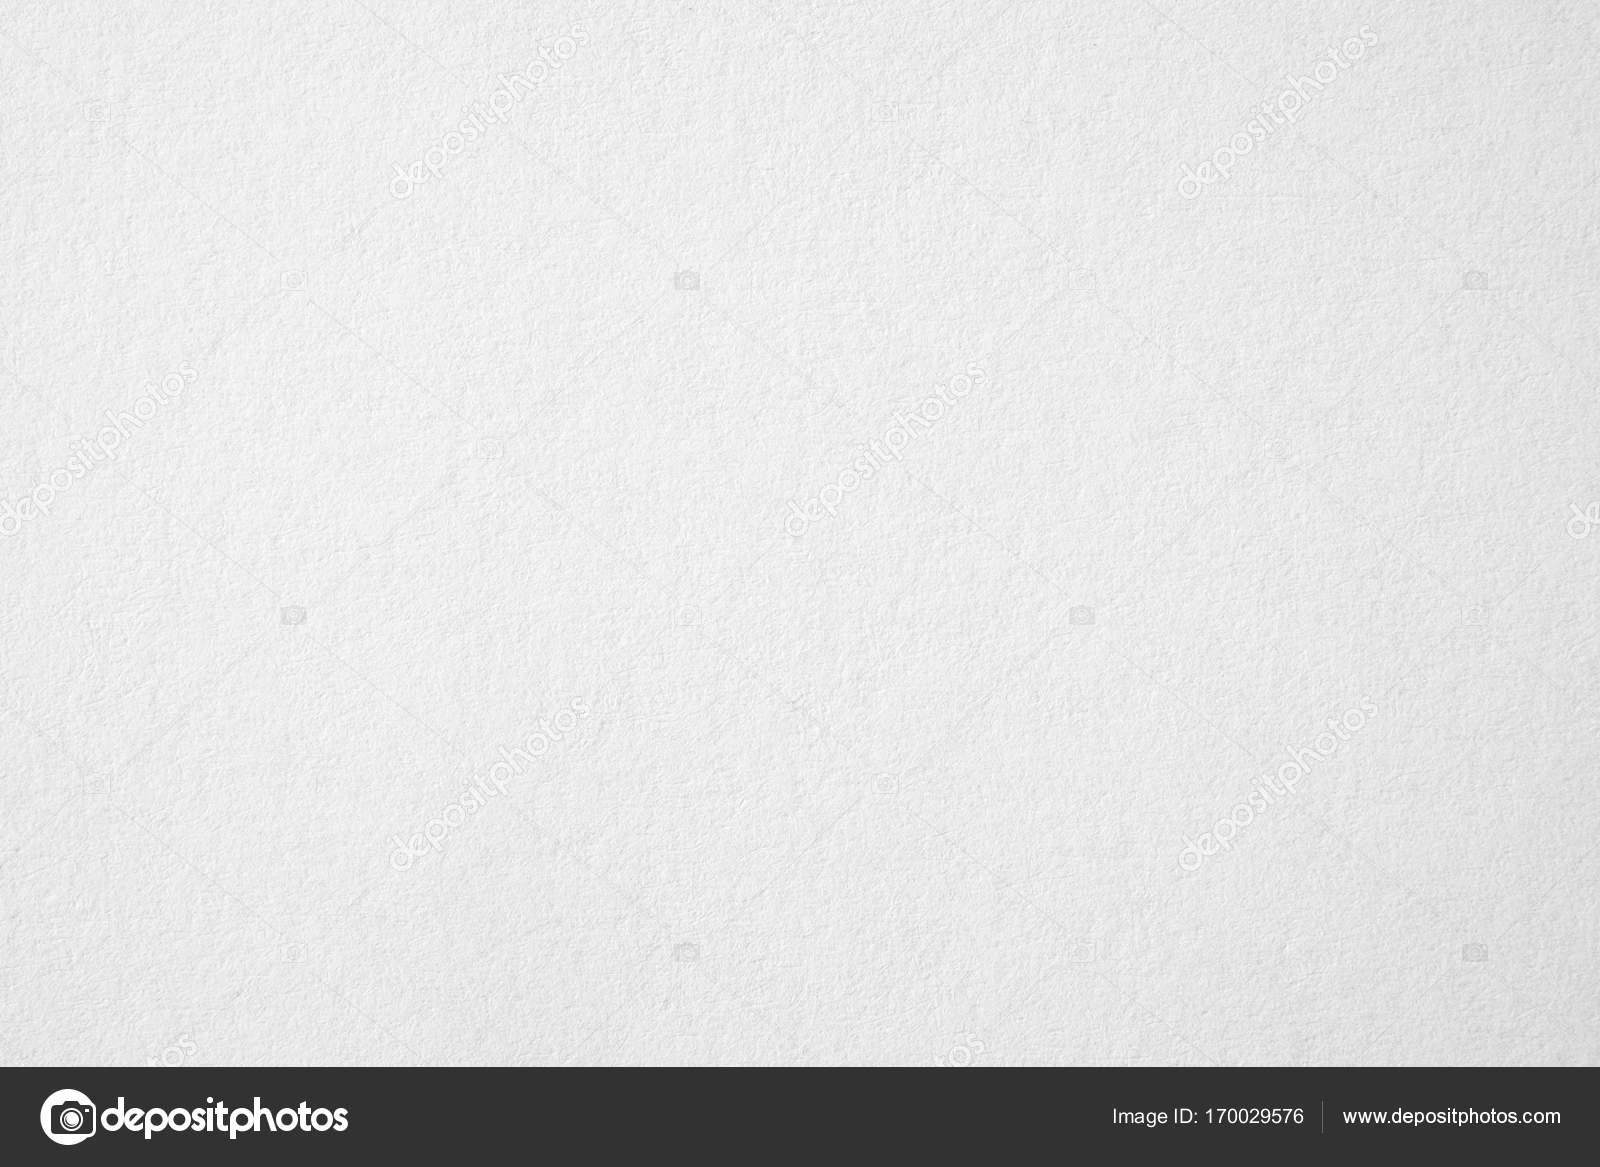 Trama Di Sfondo Bianco Carta Foto Stock Nattapol 170029576